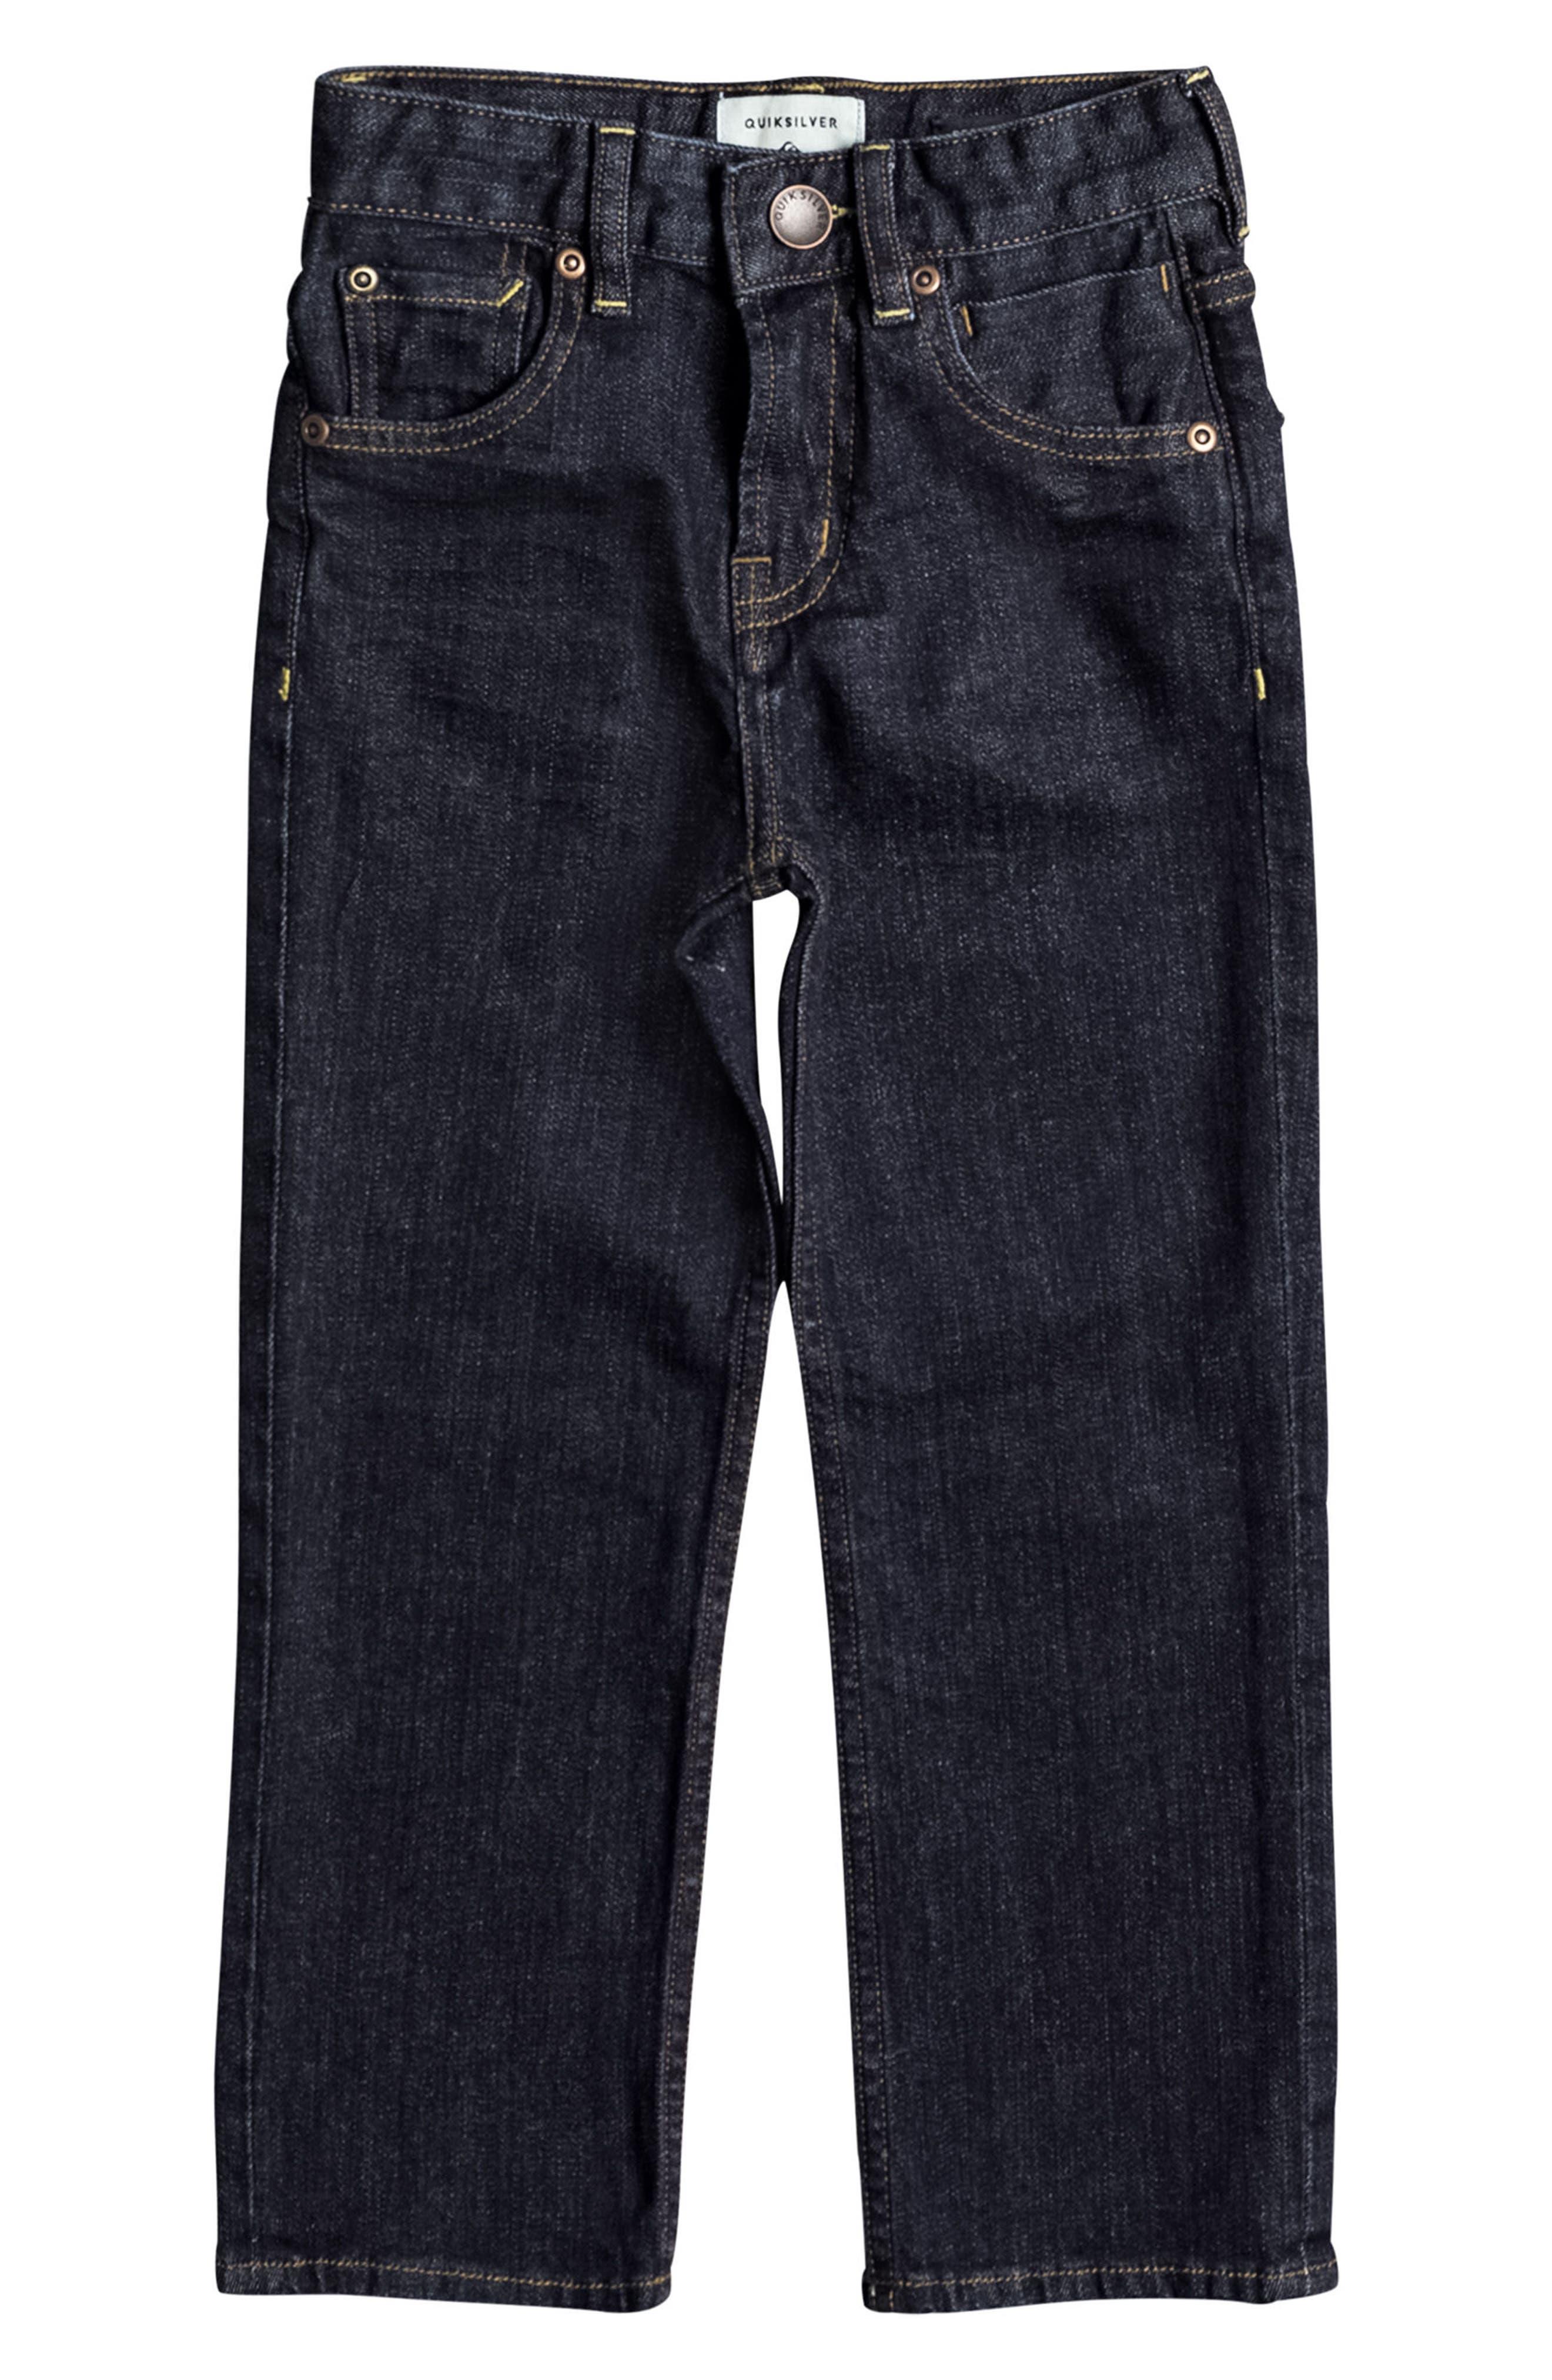 Alternate Image 1 Selected - Quiksilver Sequel 5-Pocket Jeans (Big Boys)